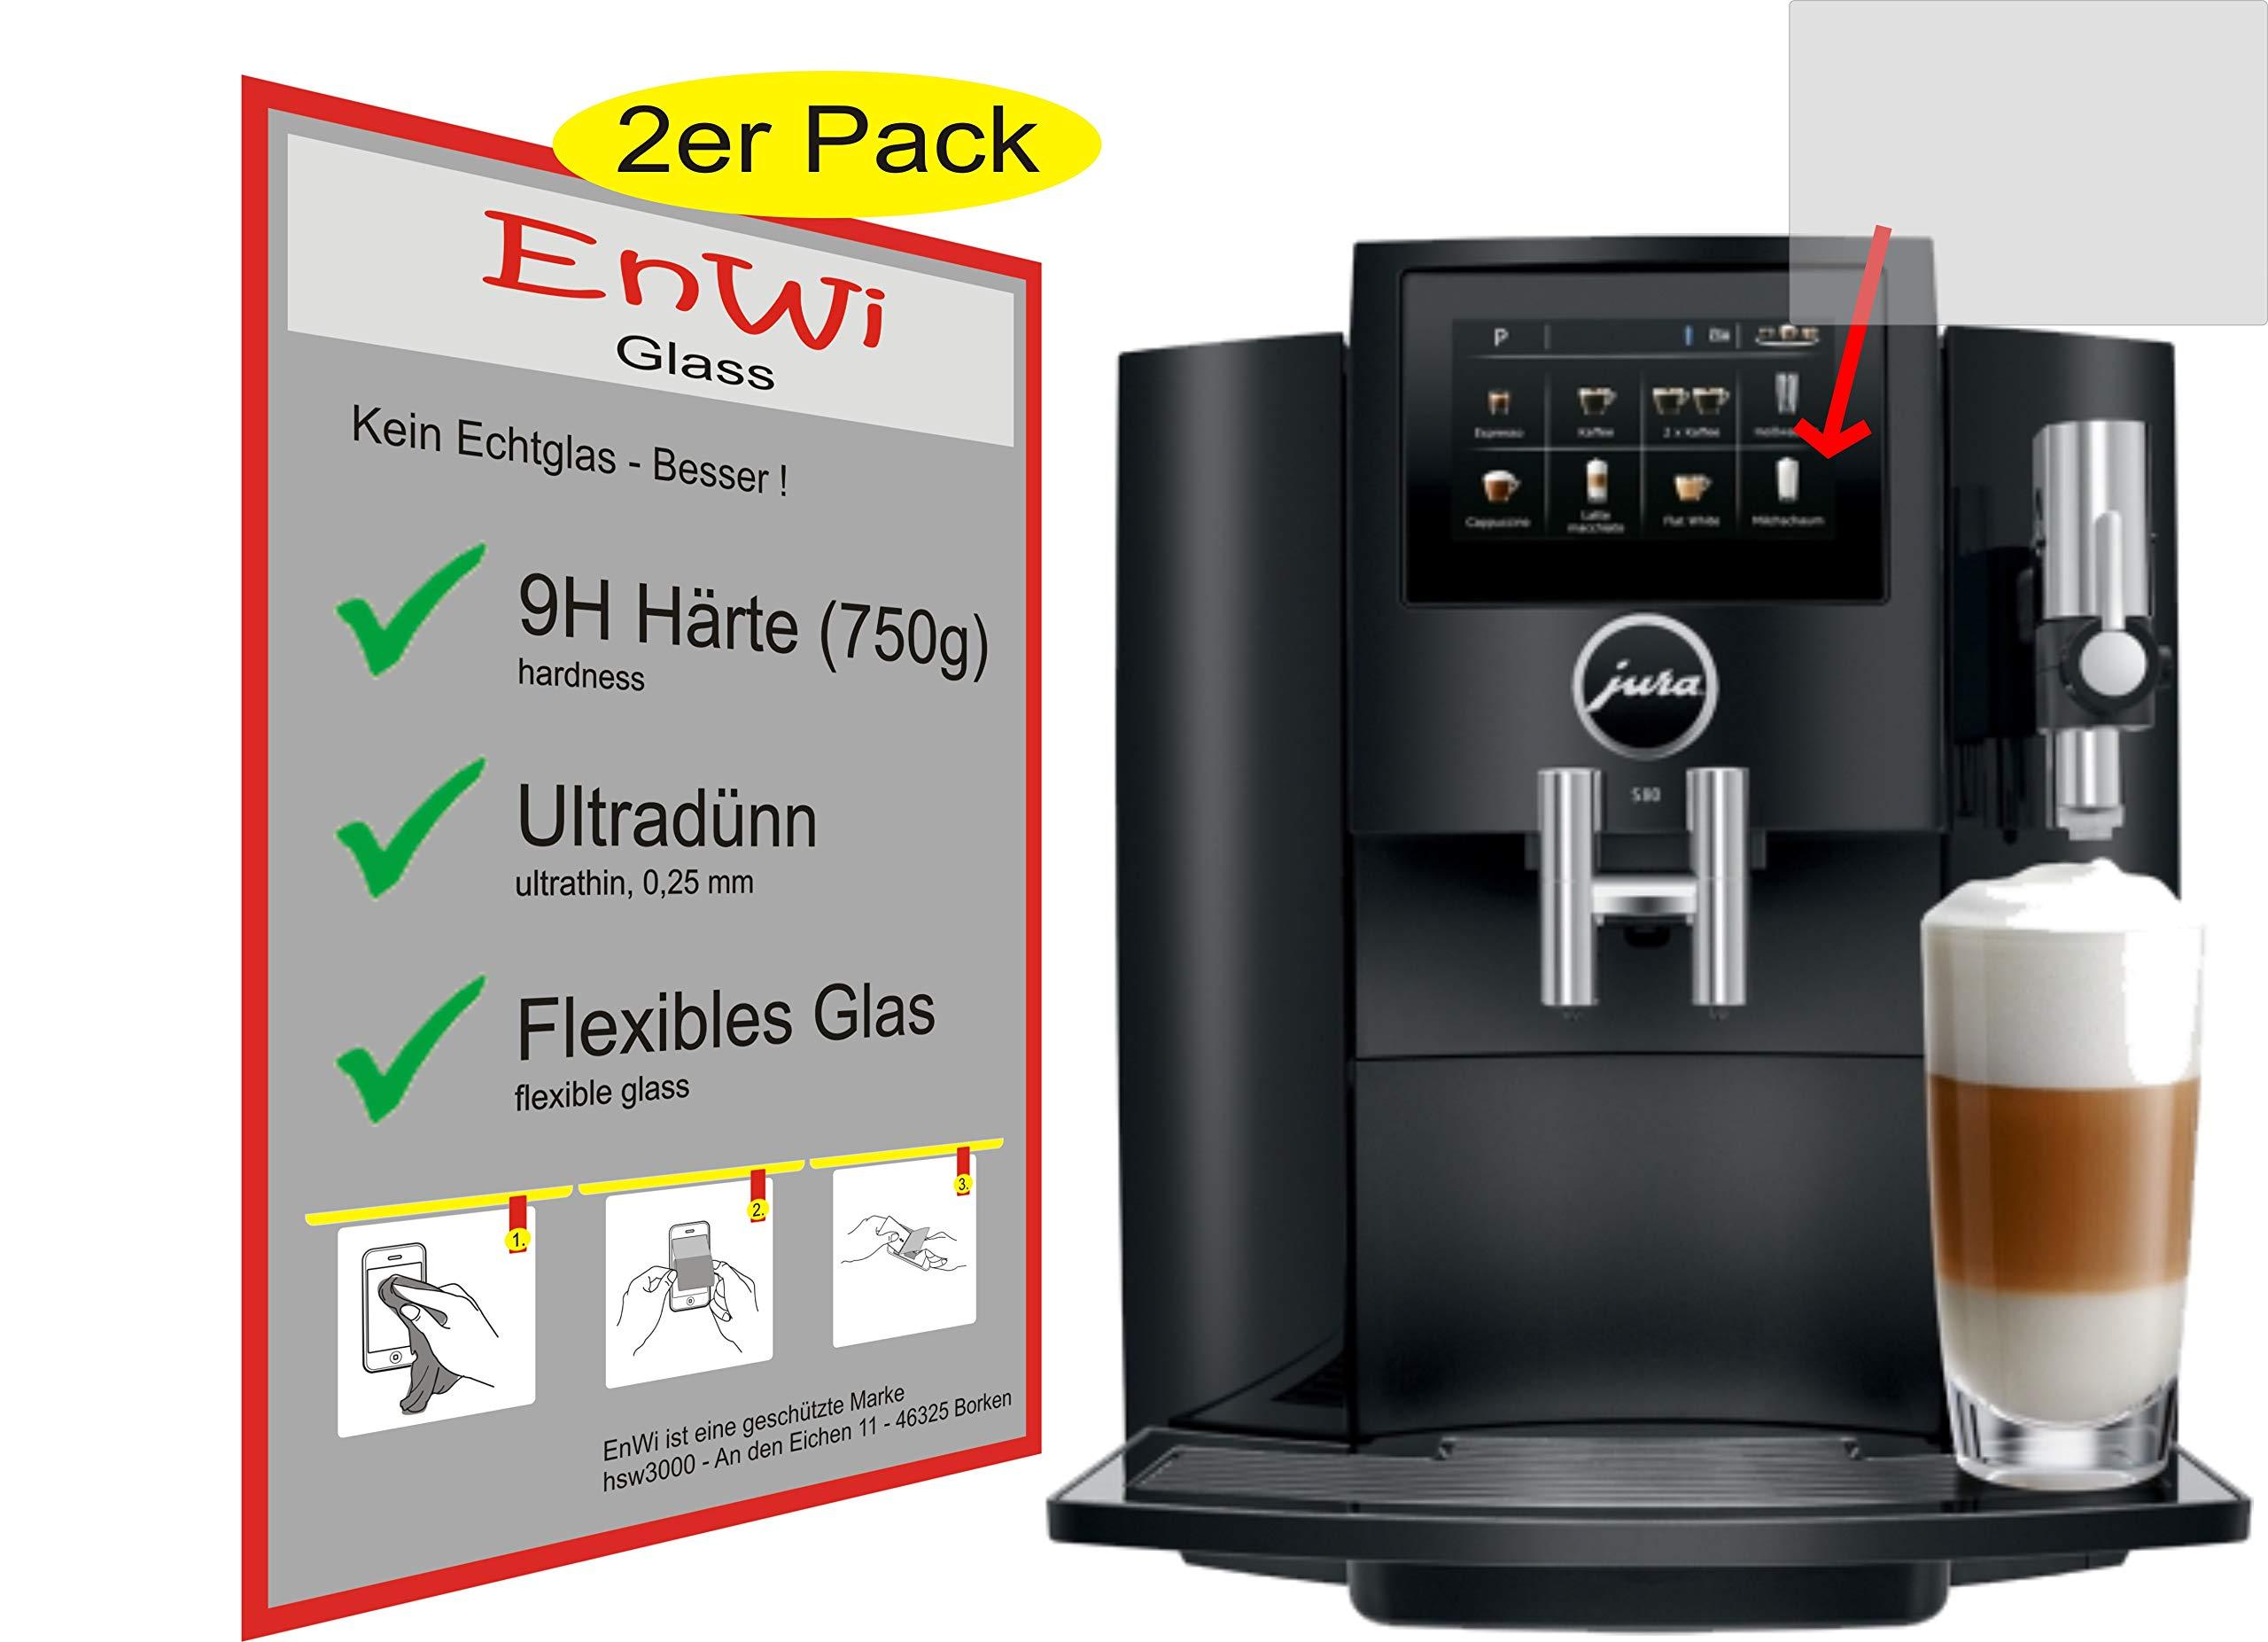 2X-EnWi-Glass-Panzerfolie-9H-750g-HRTE-Displayschutzfolie-fr-Jura-S80-15204-Kaffeevollautomat-Panzerglasfolie-Panzerglas